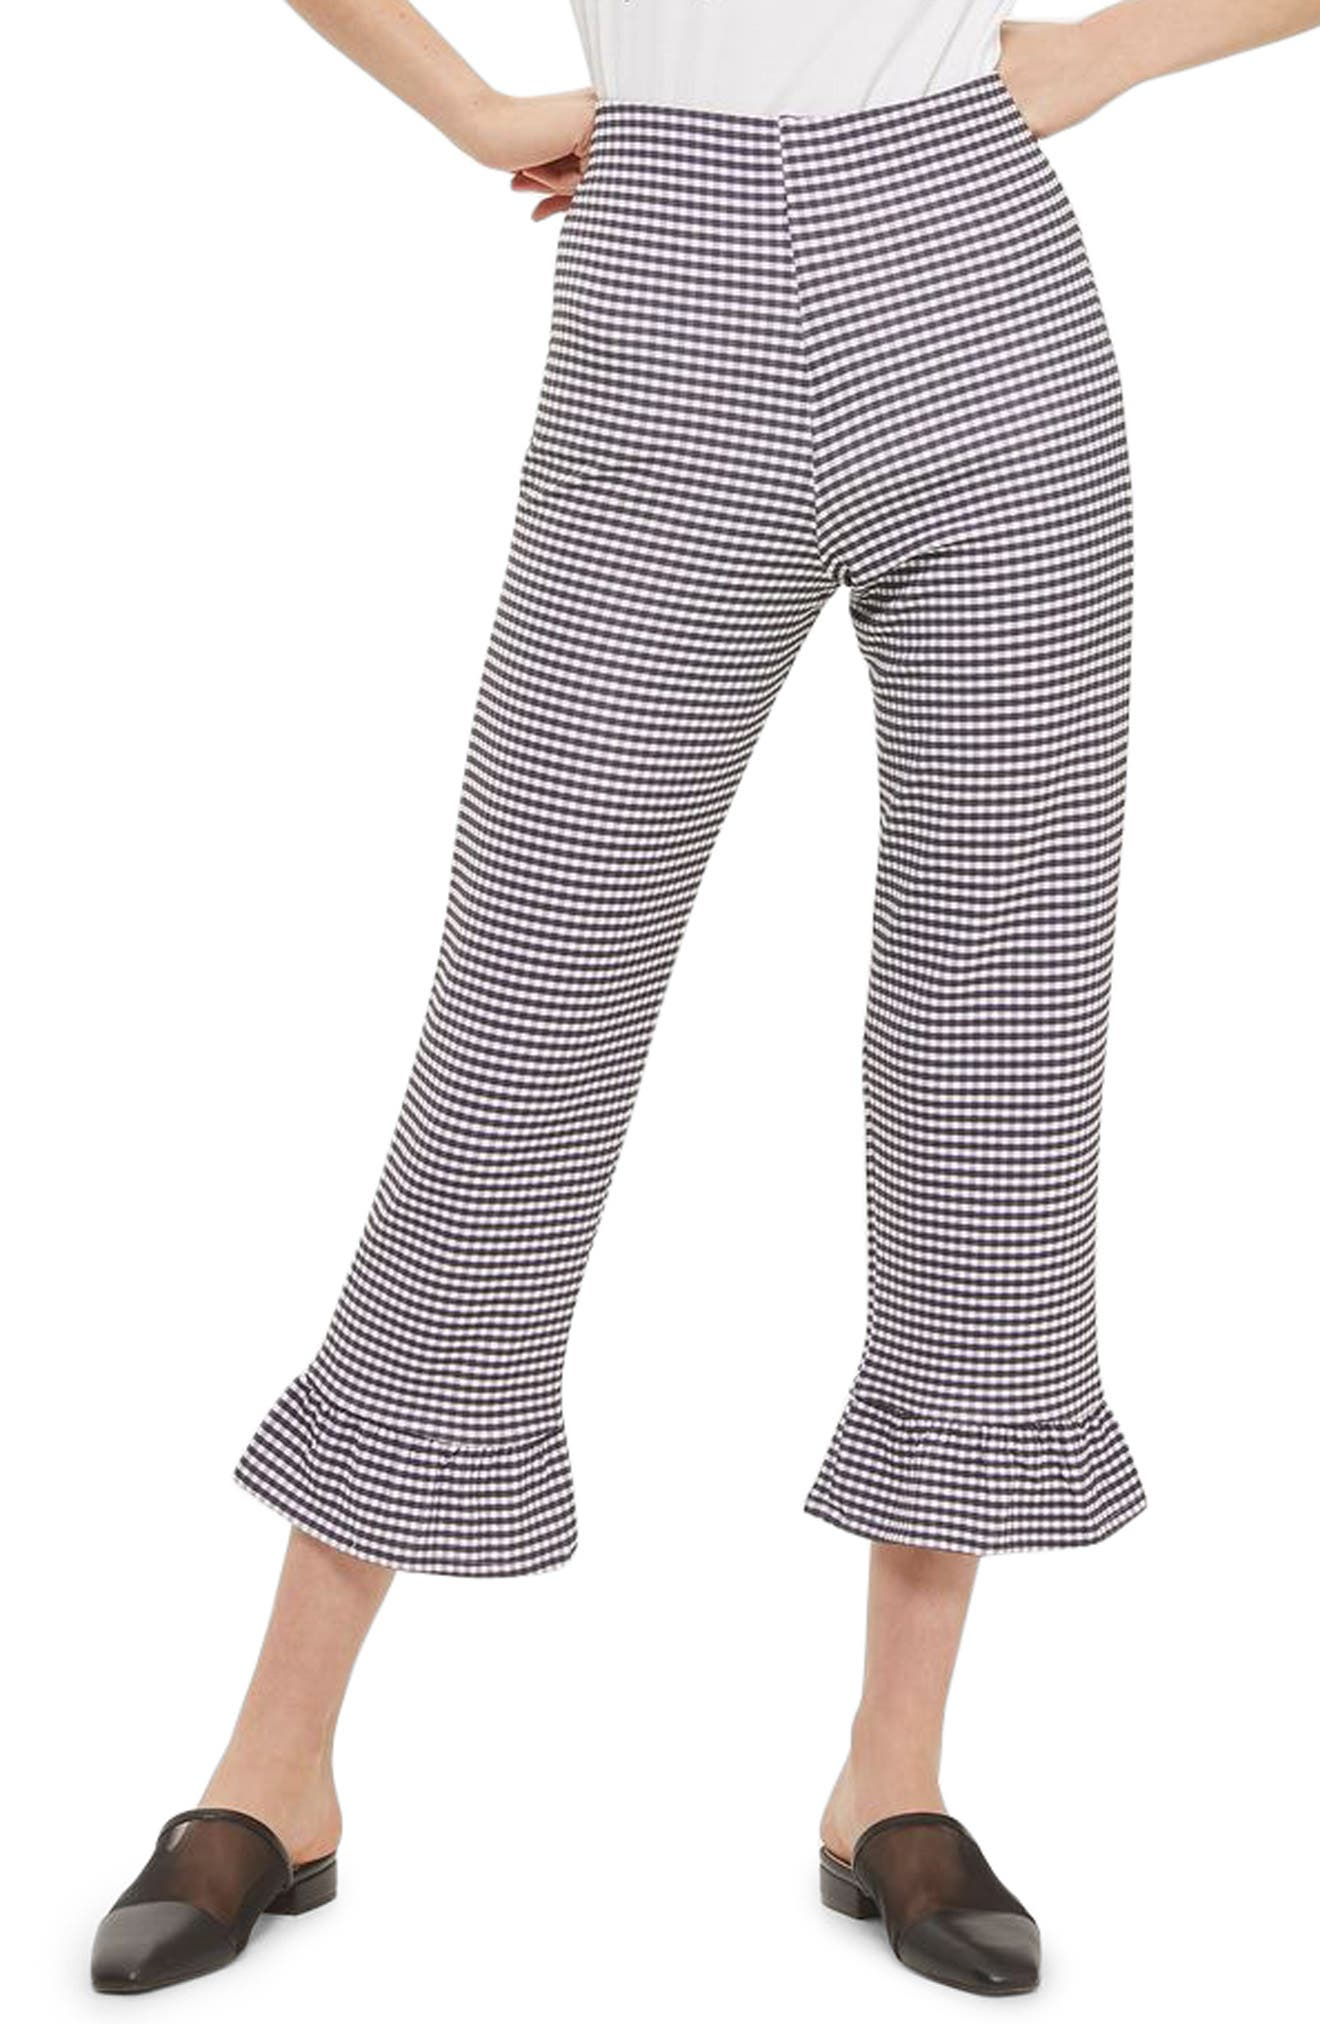 Main Image - Topshop Gingham Ruffle Capri Trousers